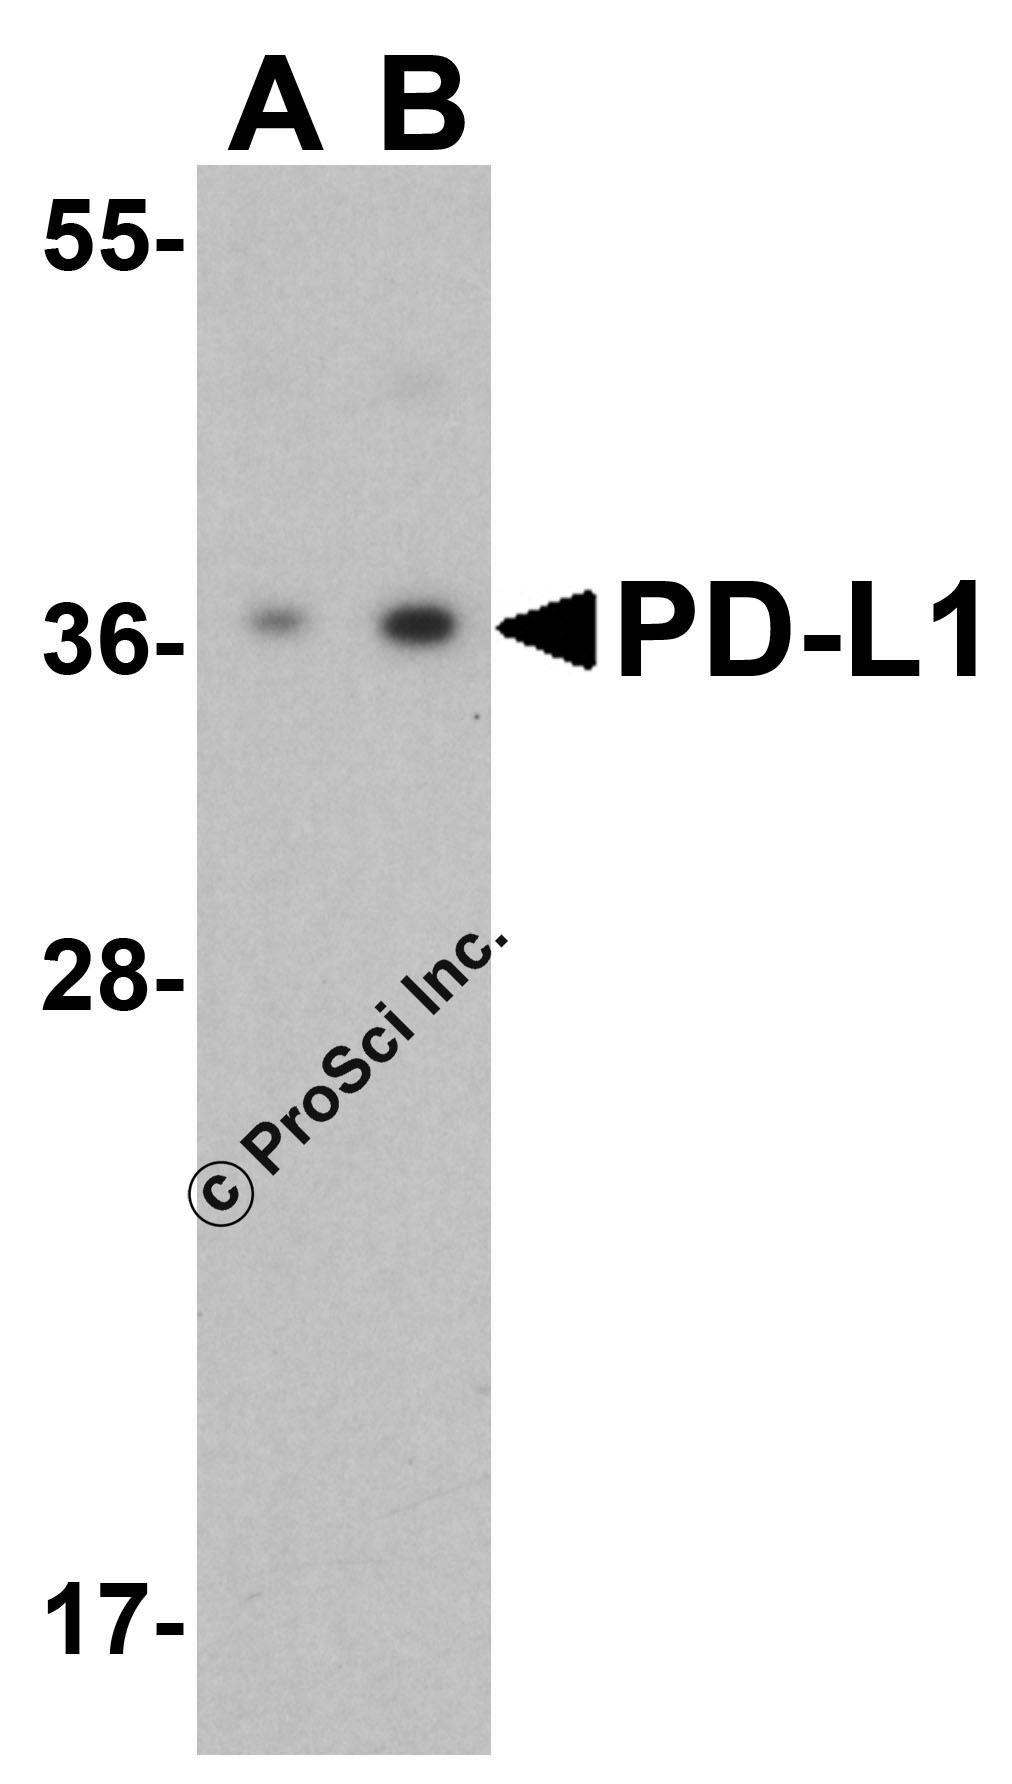 PD-L1 Antibody Antibody by Prosci Inc